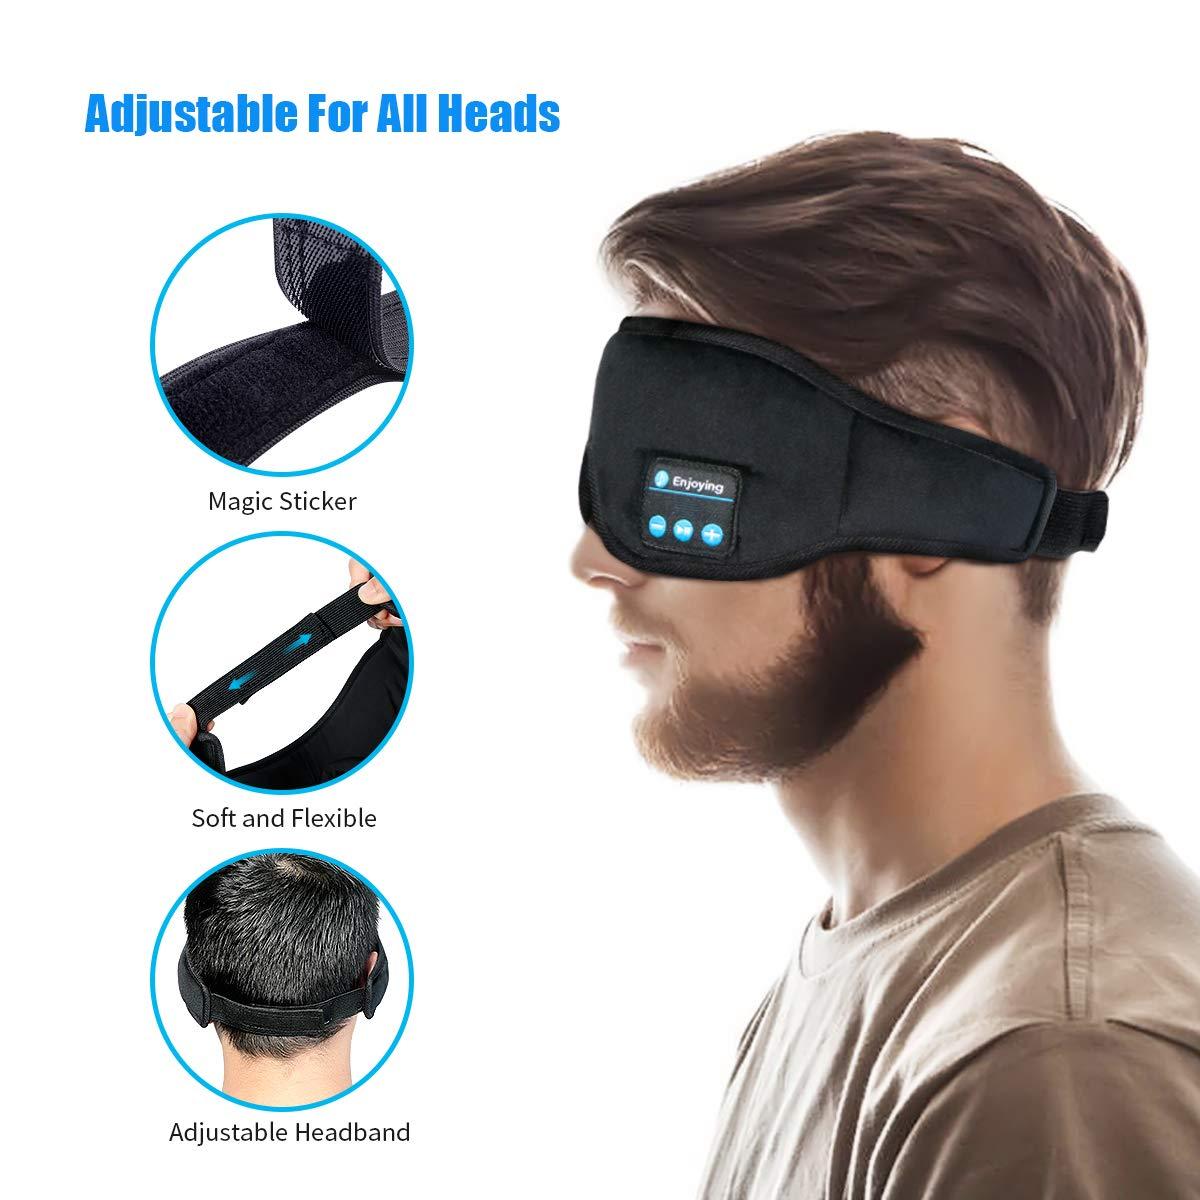 Upgraded Bluetooth Eye Mask Sleep Headphones,WU-MINGLU Wireless Music Silk Eye Cover Sleeping Mask Headphones Built -in Speakers Microphone Handsfree Adjustable and Washable